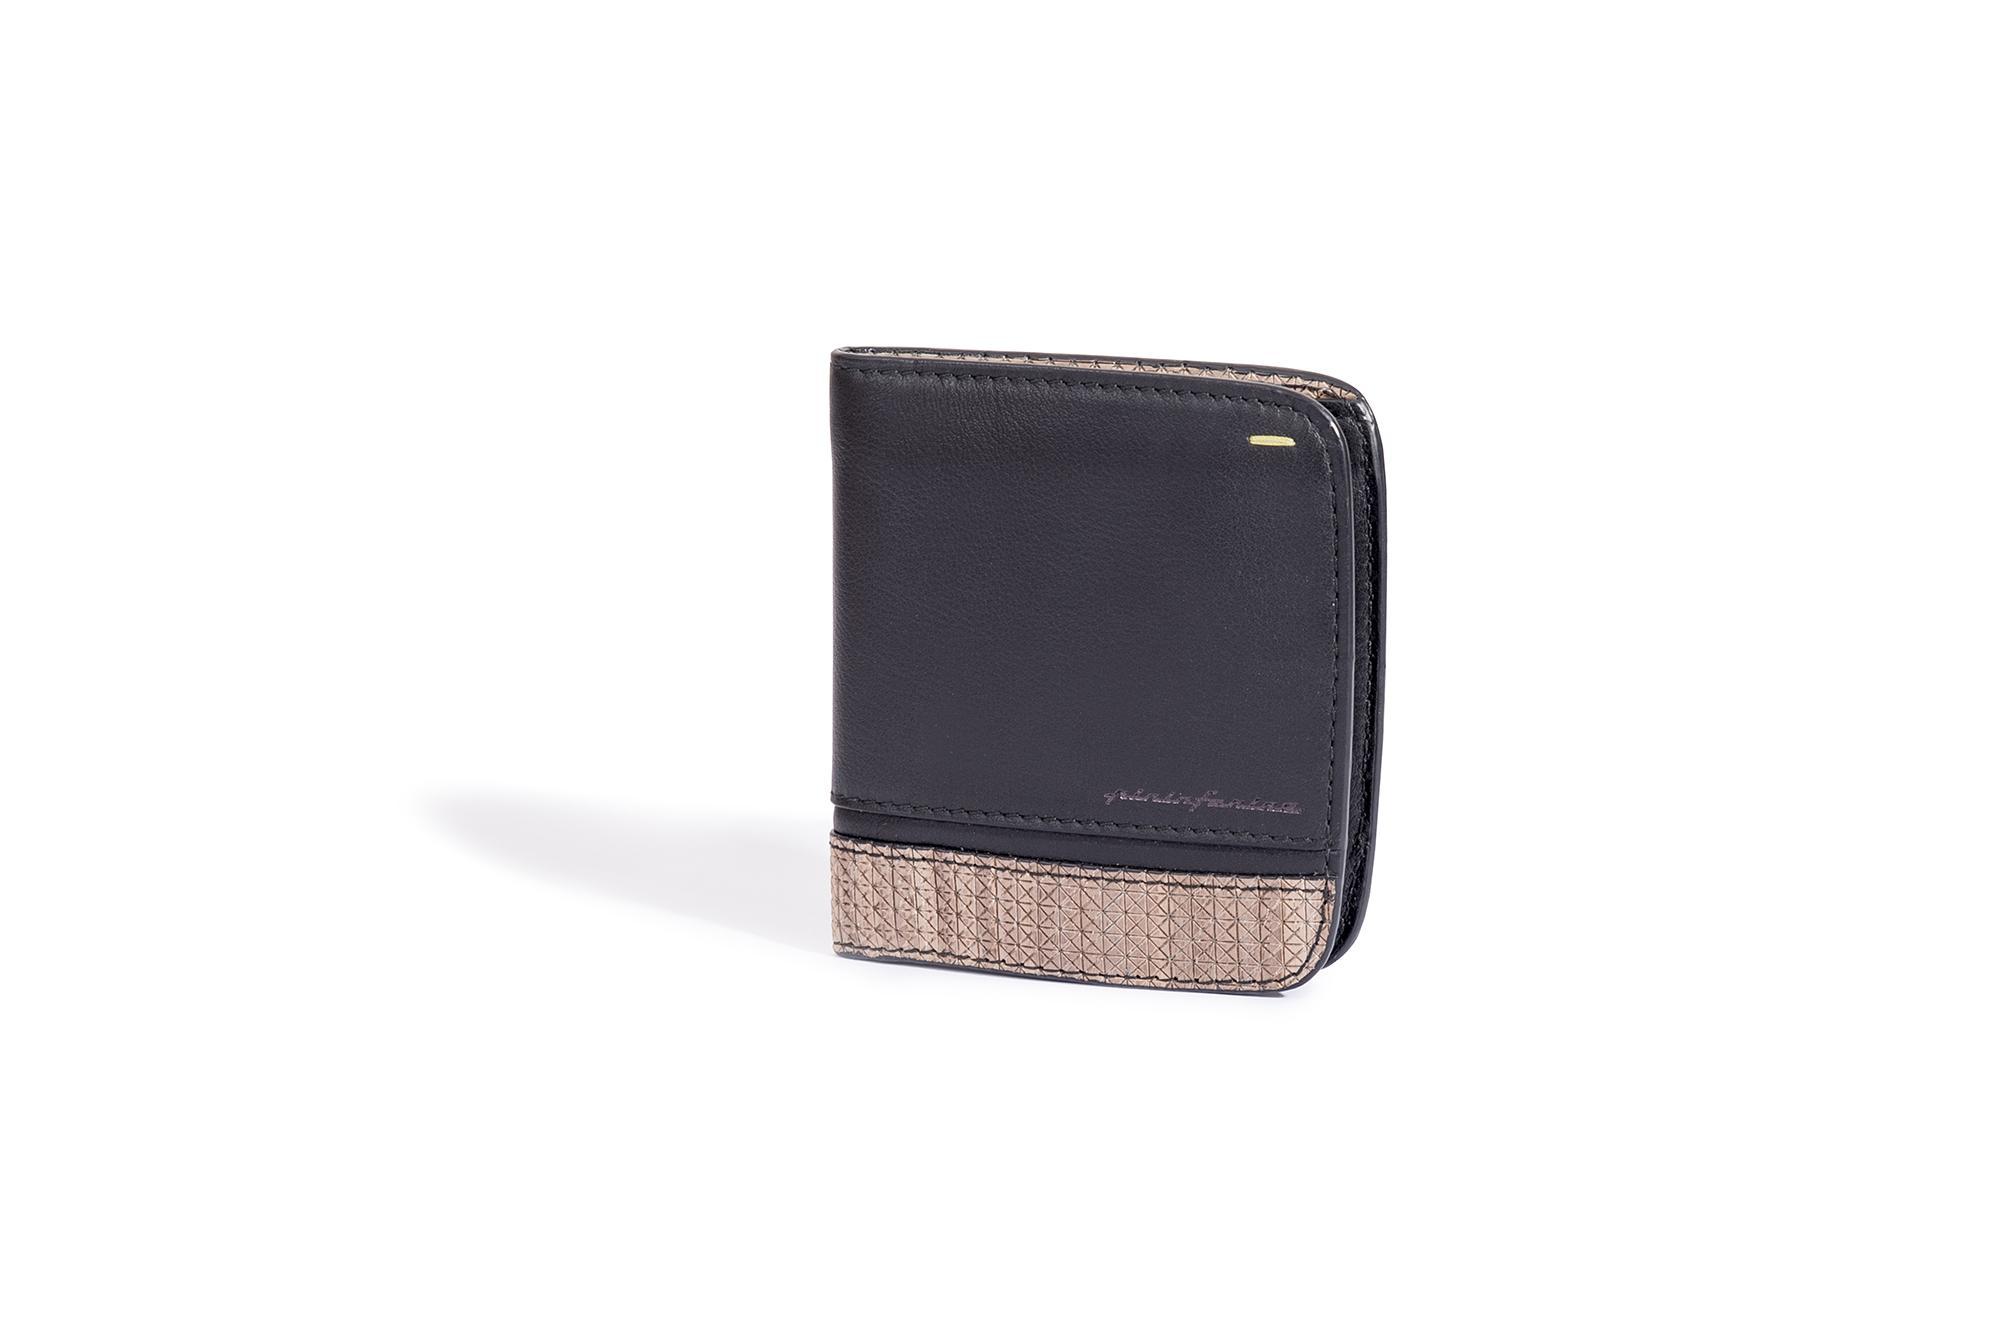 Wallet Walnut Pininfarina Store